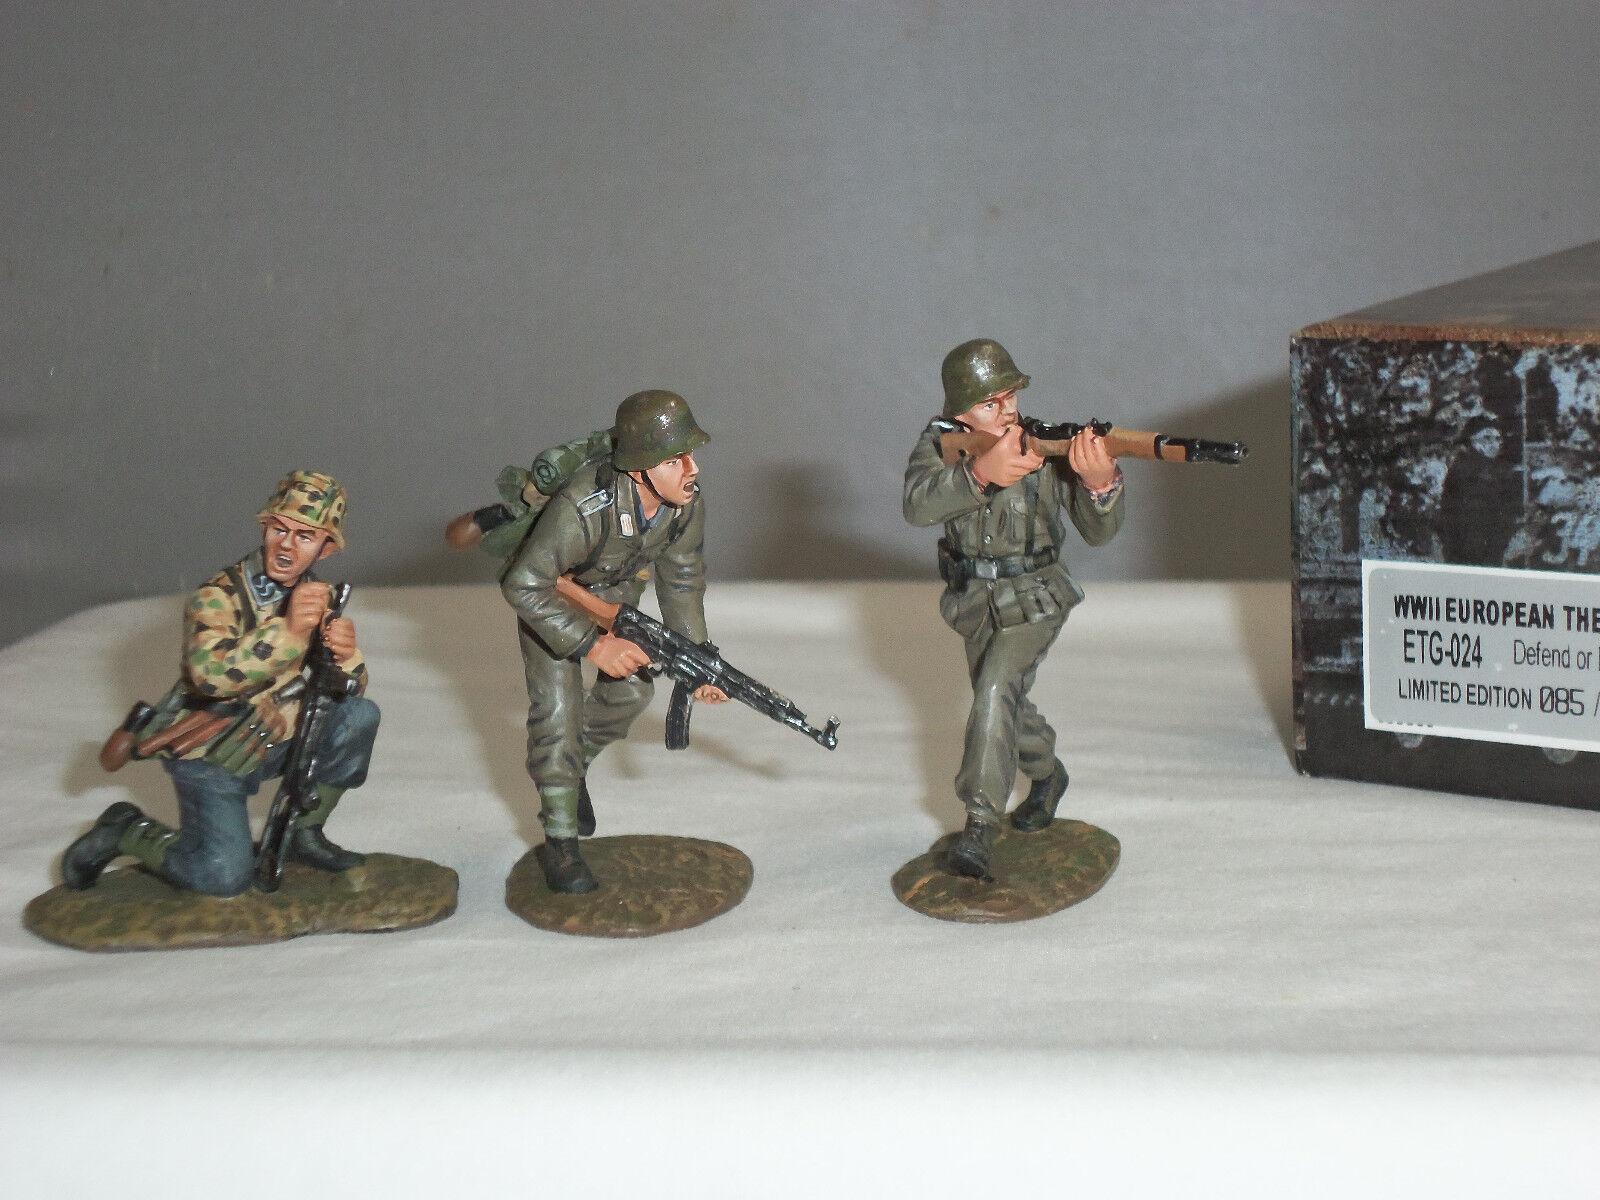 FIGARTI ETG024 GERMAN ARMY DEFEND OR DIE WORLD WAR TWO METAL TOY SOLDIER SET